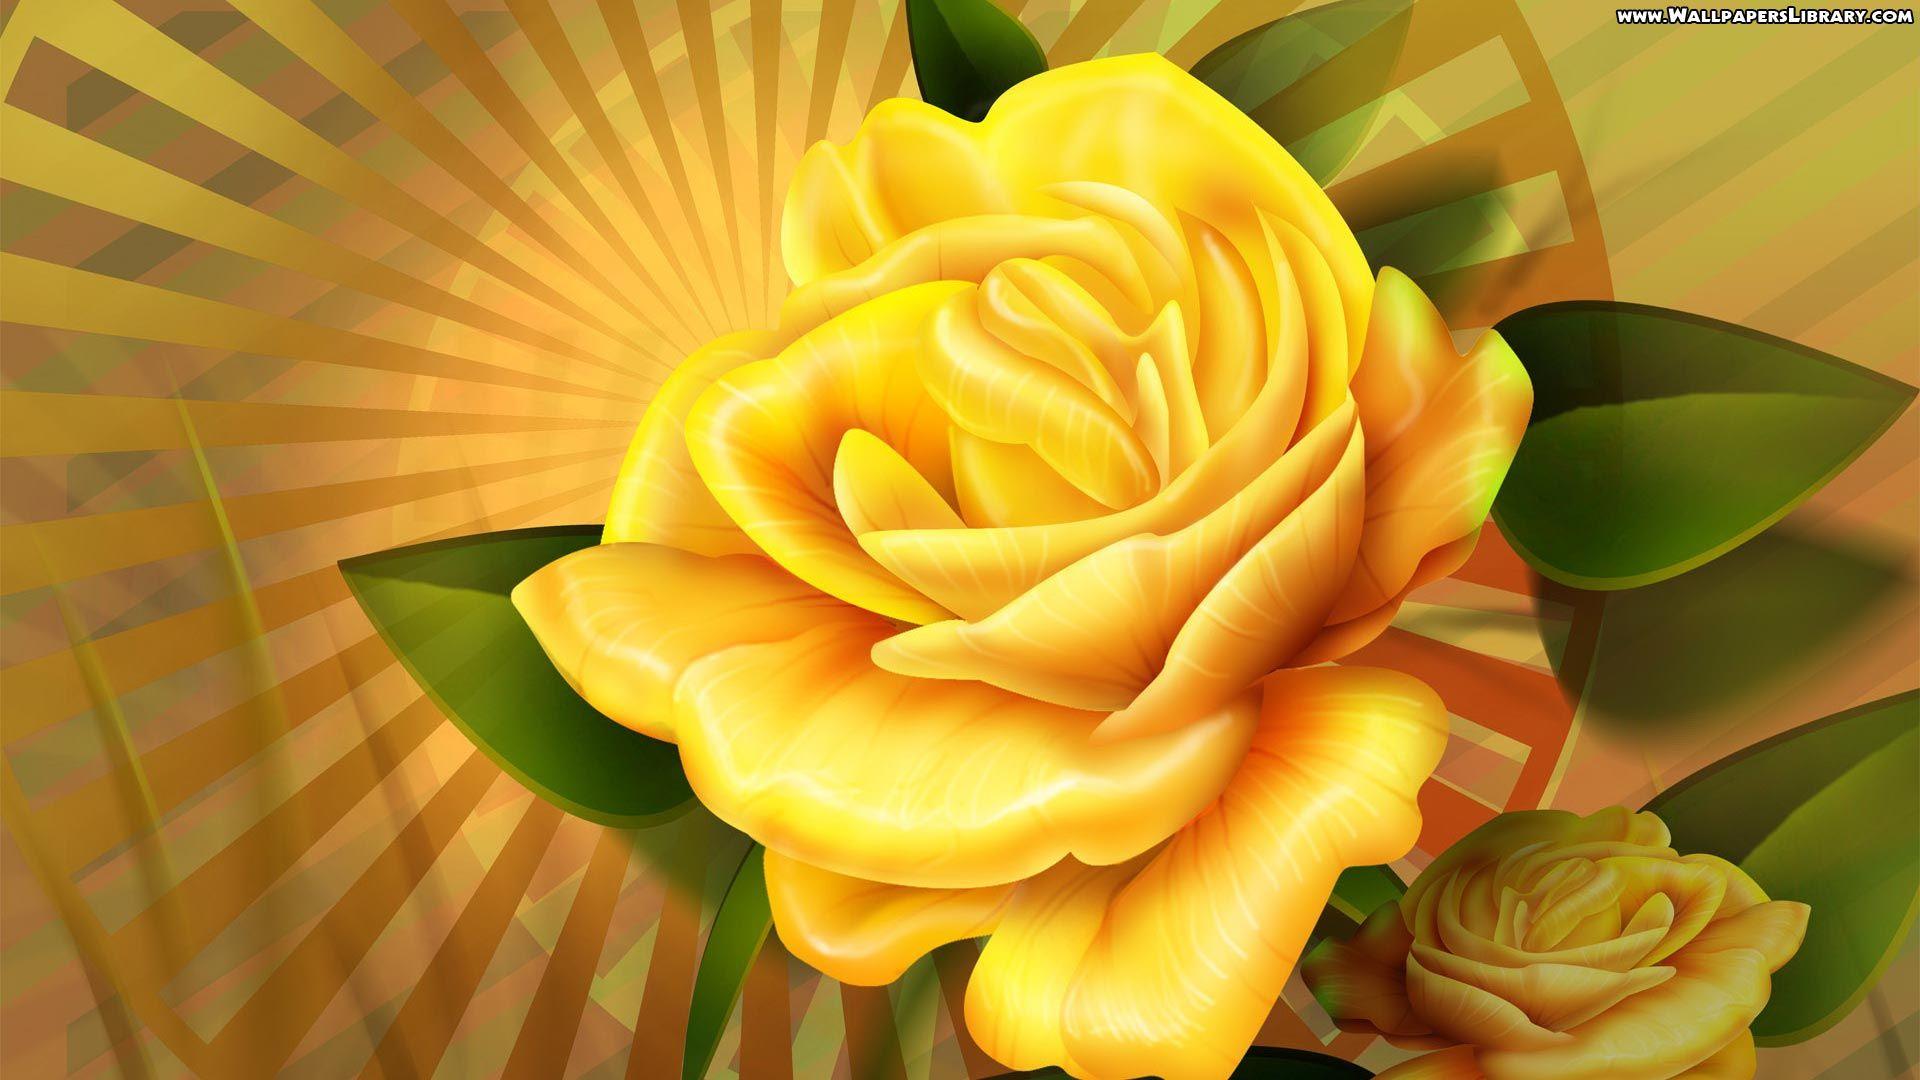 3d Yellow Rose Wallpaper Beautiful Flowers Wallpapers Rose Flower Wallpaper Flower Images Wallpapers